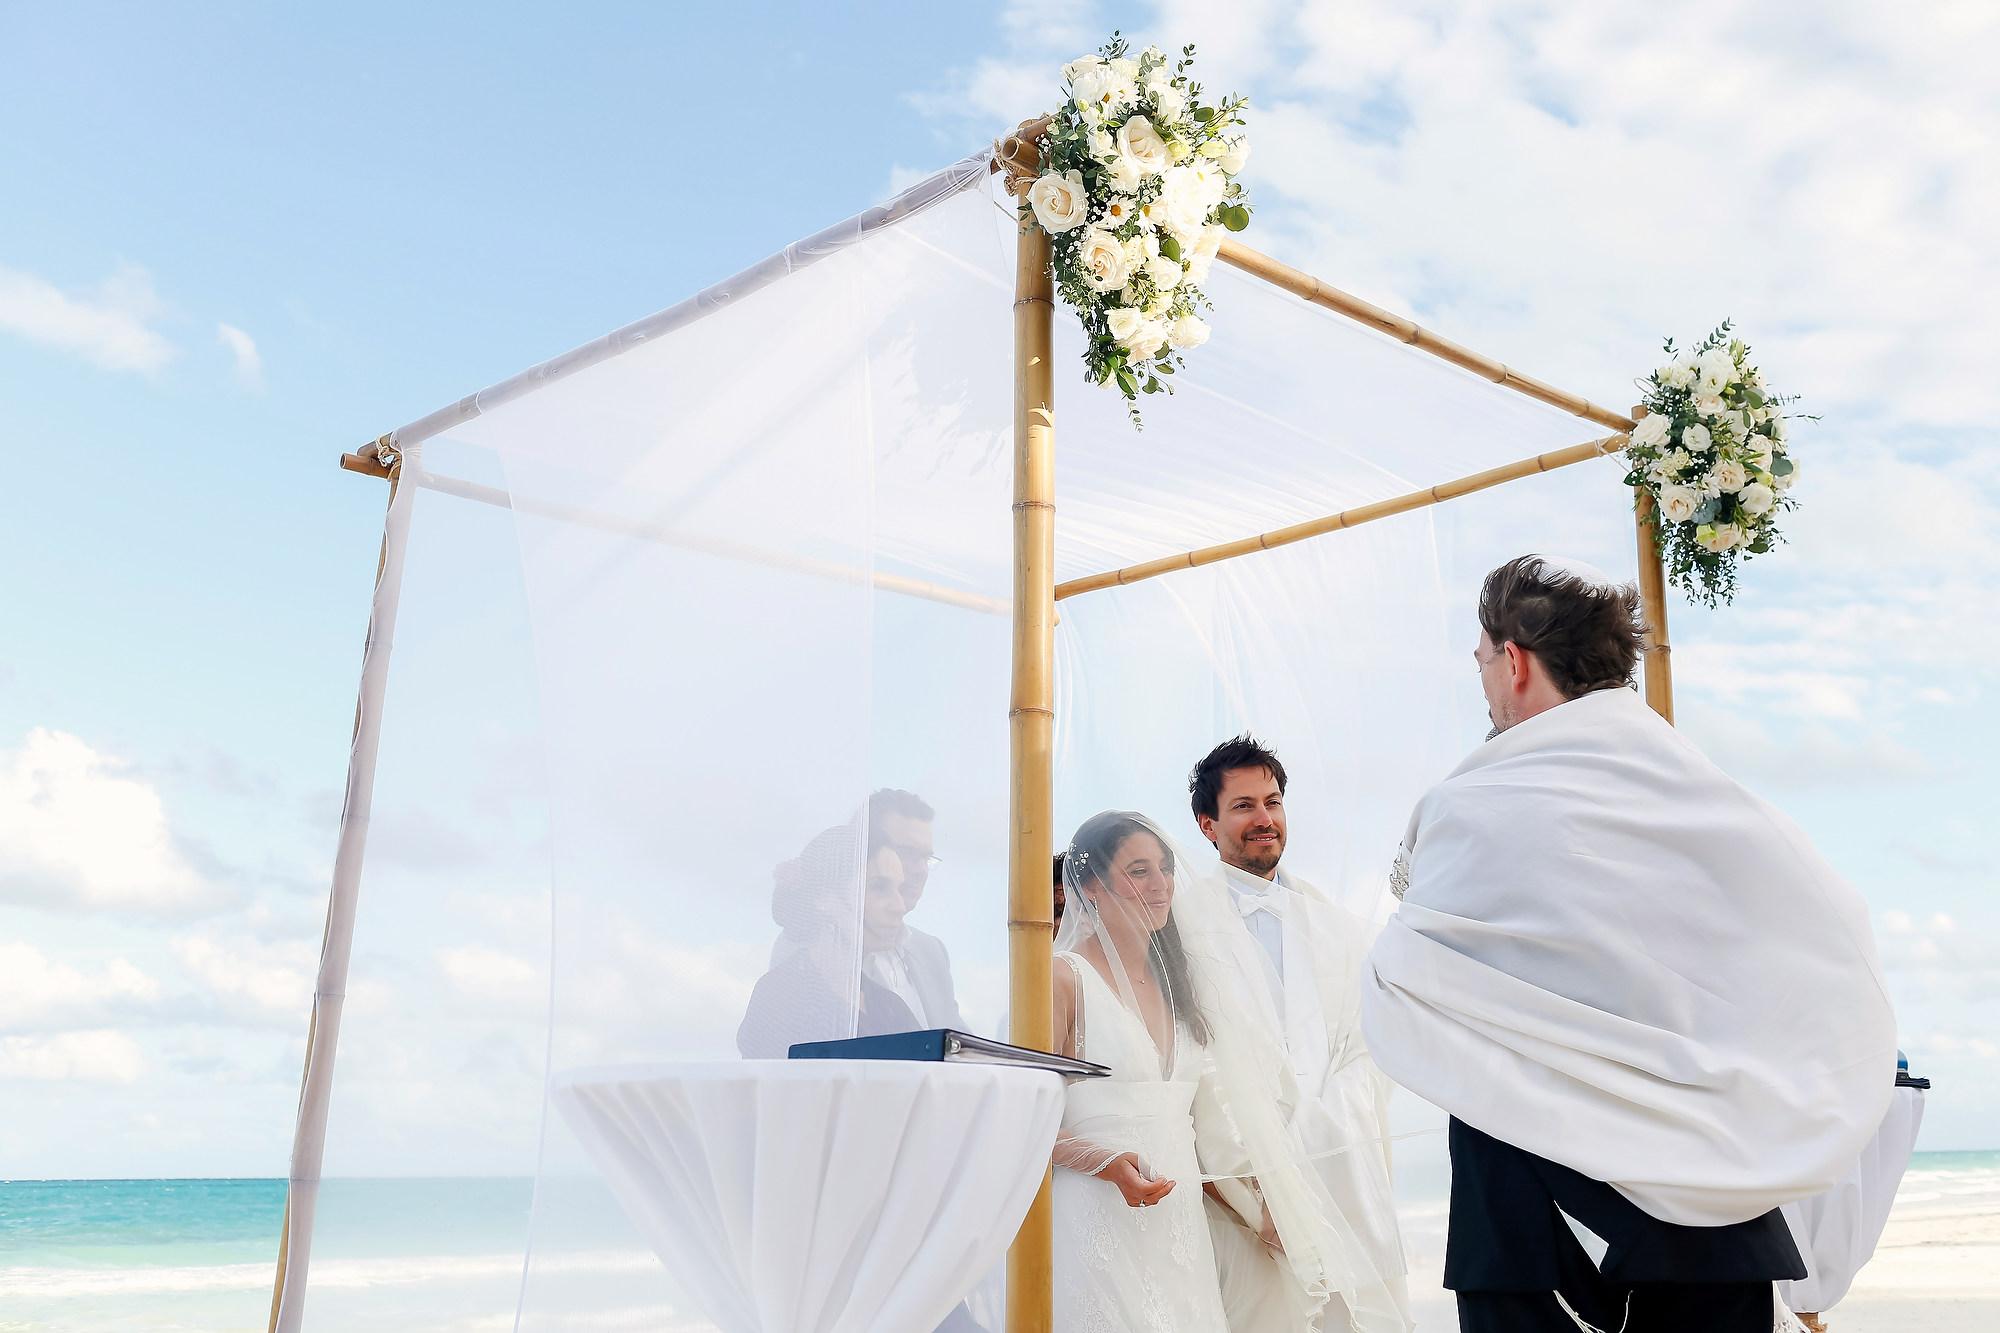 FineArt studio Destination Wedding Photographer Cancun Riviera Maya Playa del Carmen Mexico www.fineartstudioweddings.com